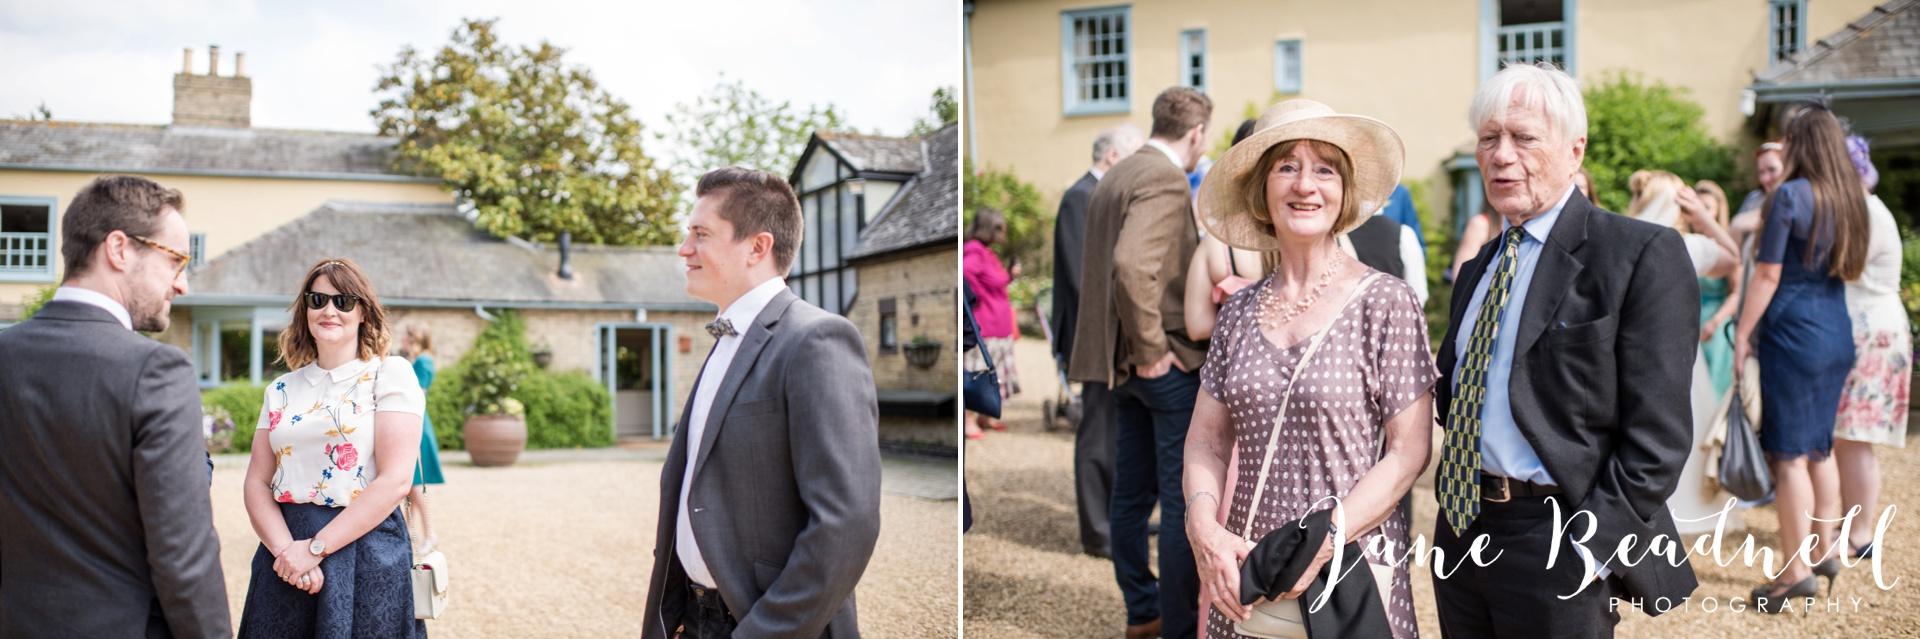 South Farm Wedding photography Hertfordshire by Jane Beadnell Photography fine art wedding photographer_0085